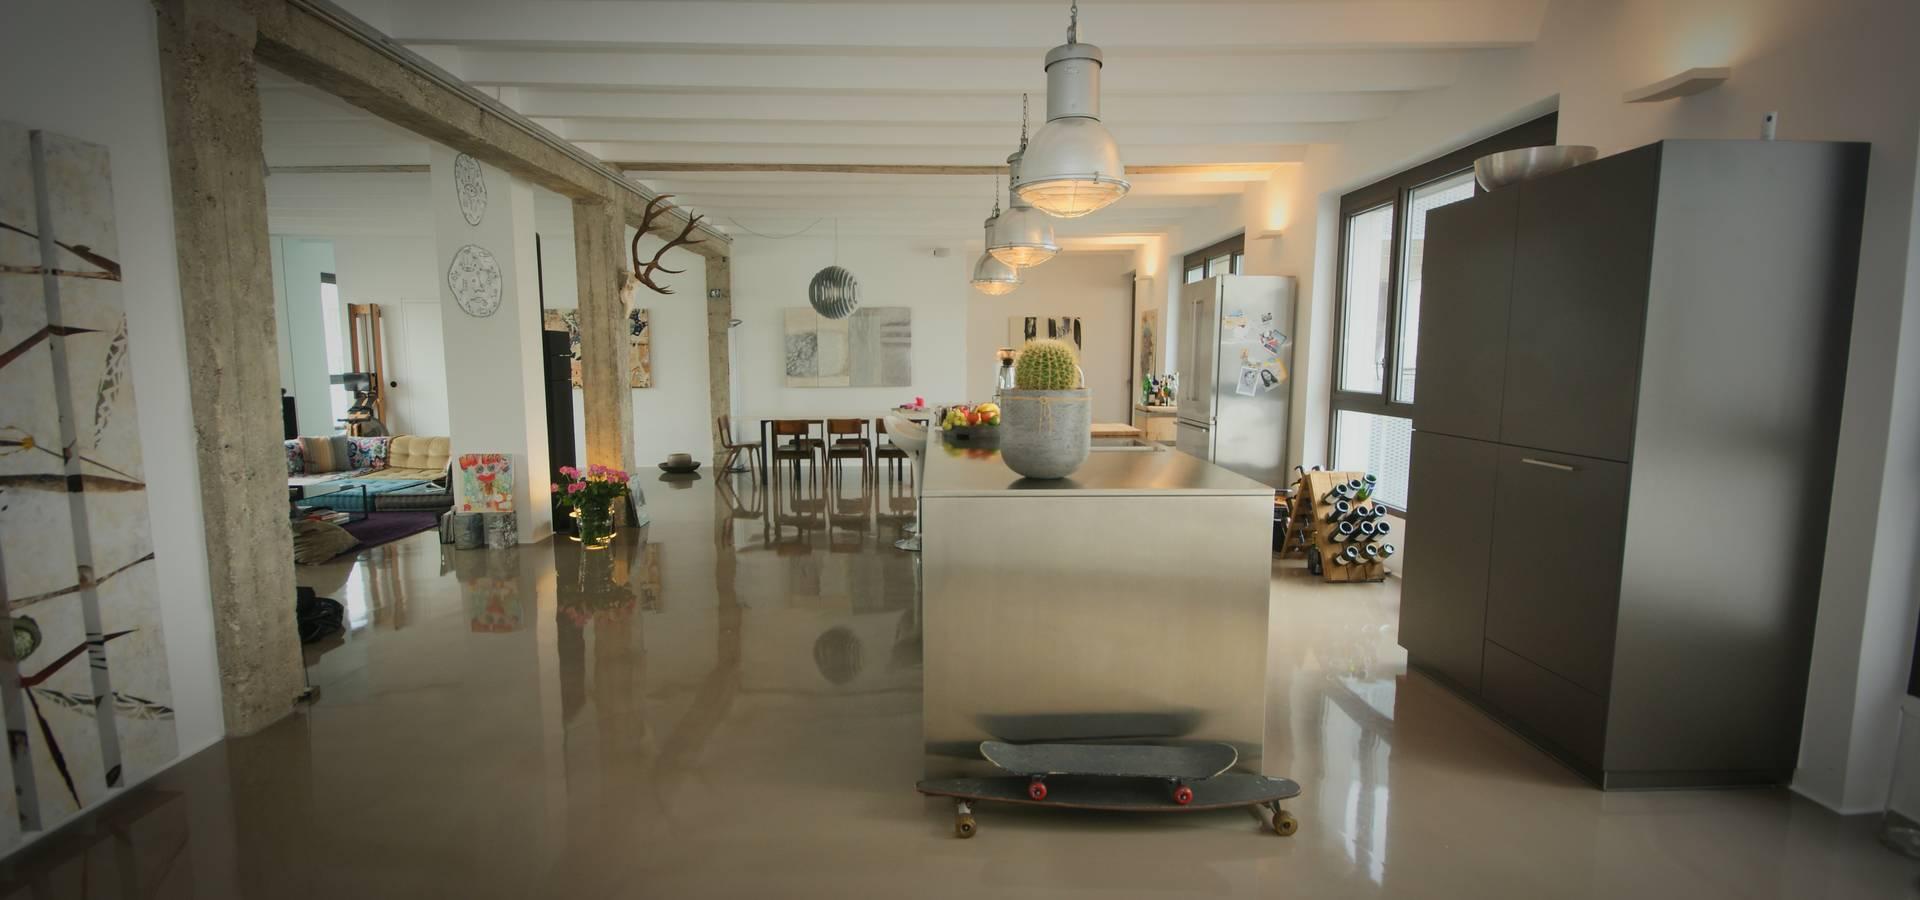 Küchen Design Ing. Keglevits GmbH